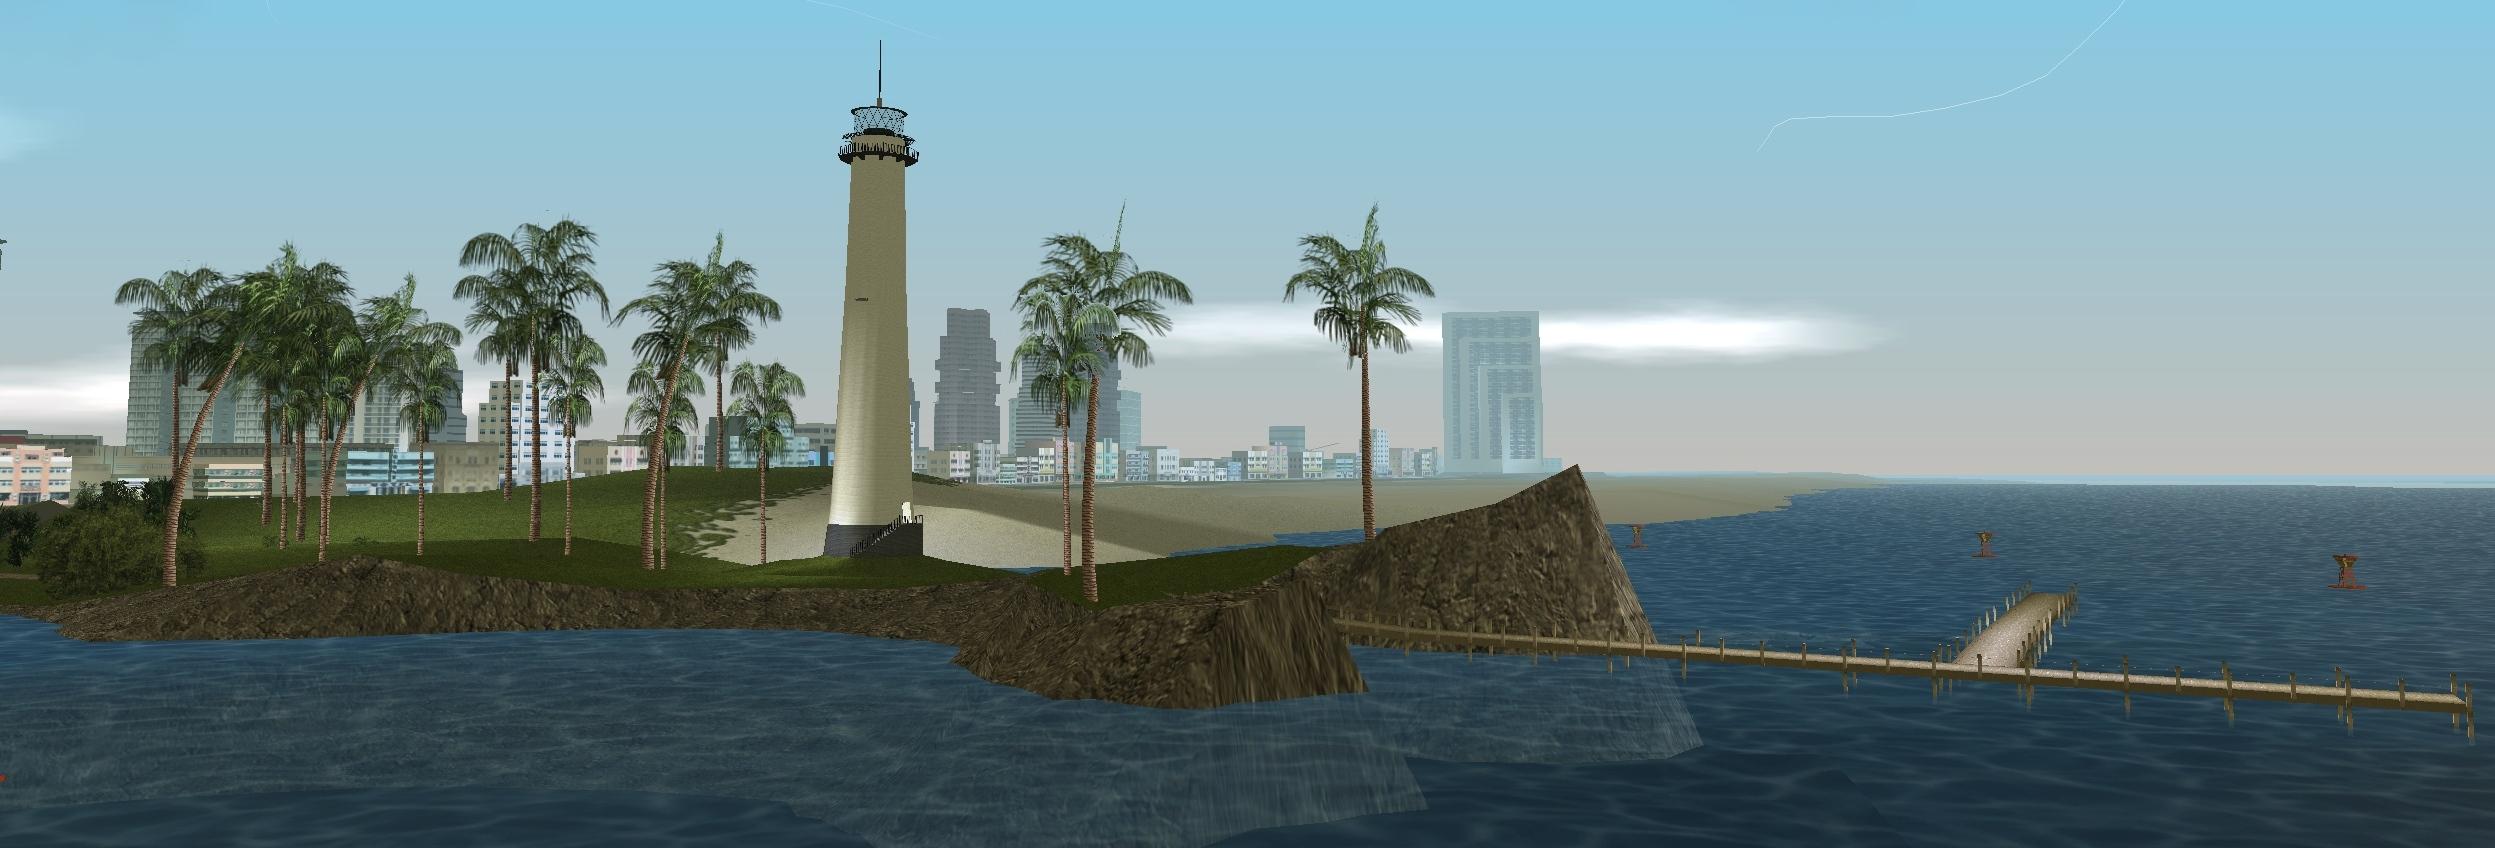 Latarnia morska w Vice City